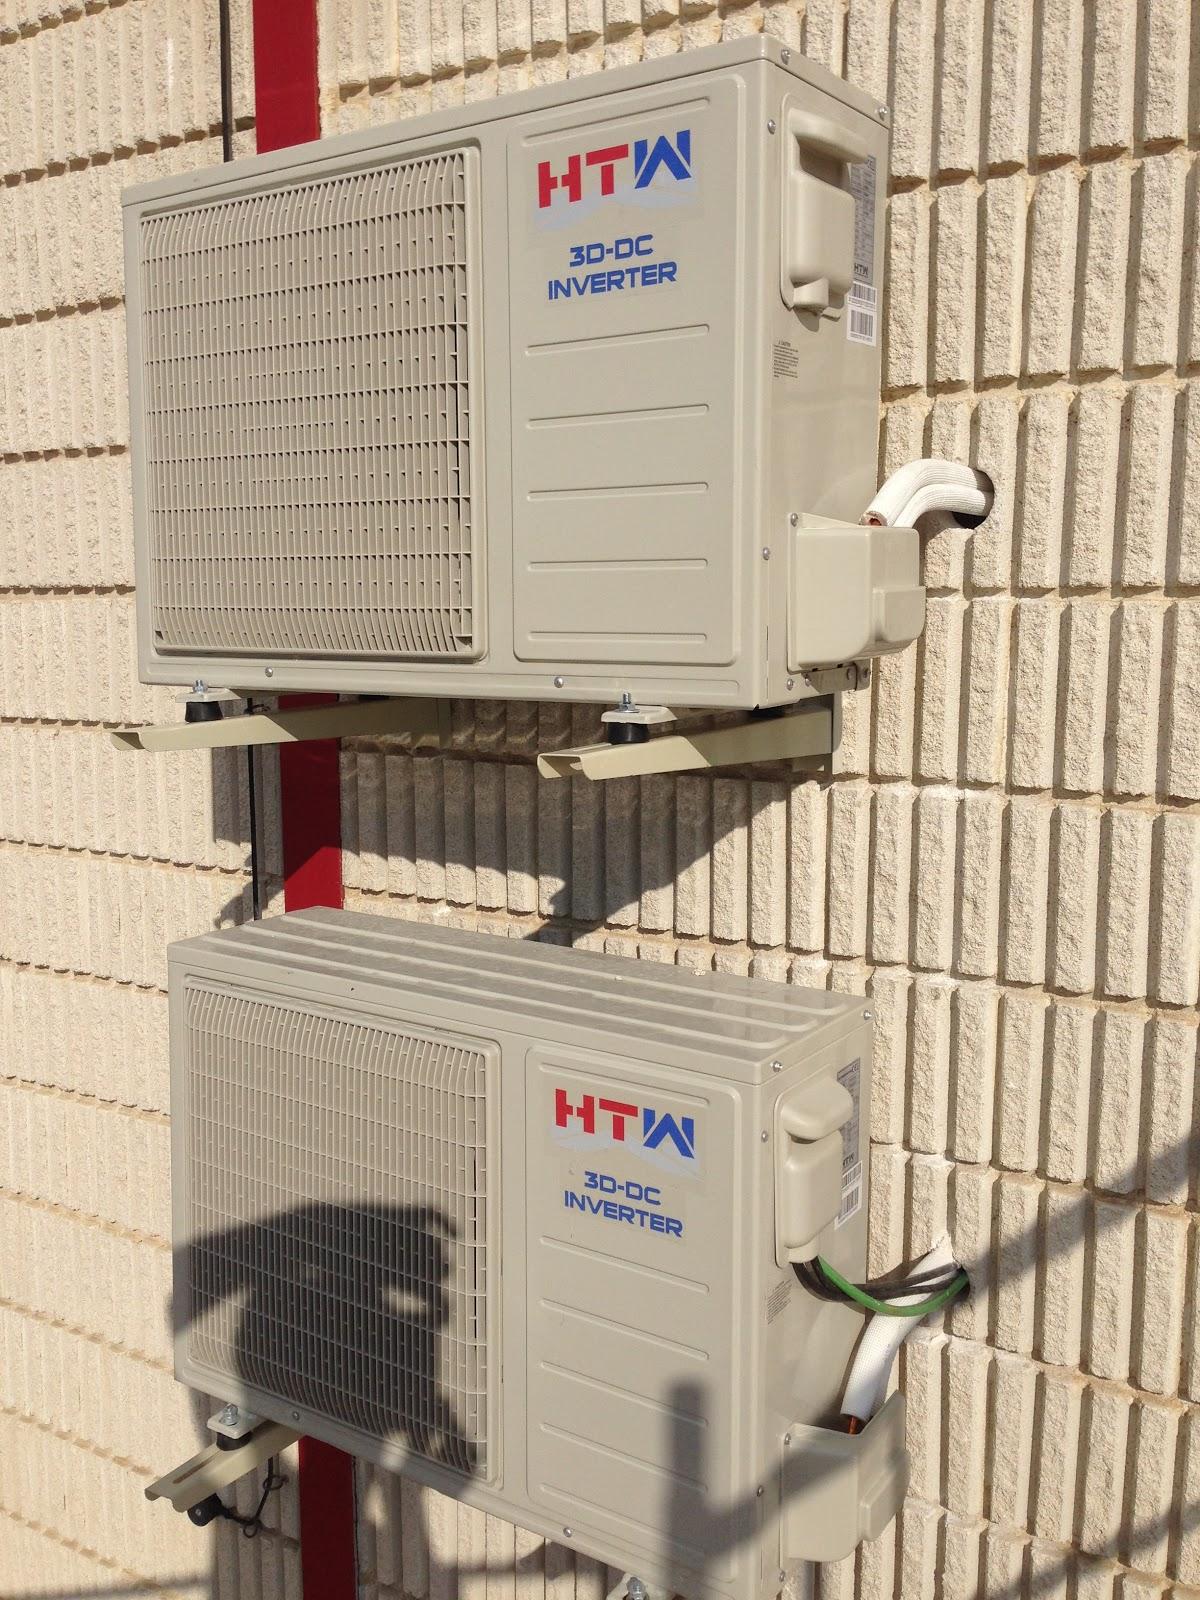 Ugical calefacci n instalaci n aire acondicionado htw for Aire acondicionado 3500 frigorias inverter